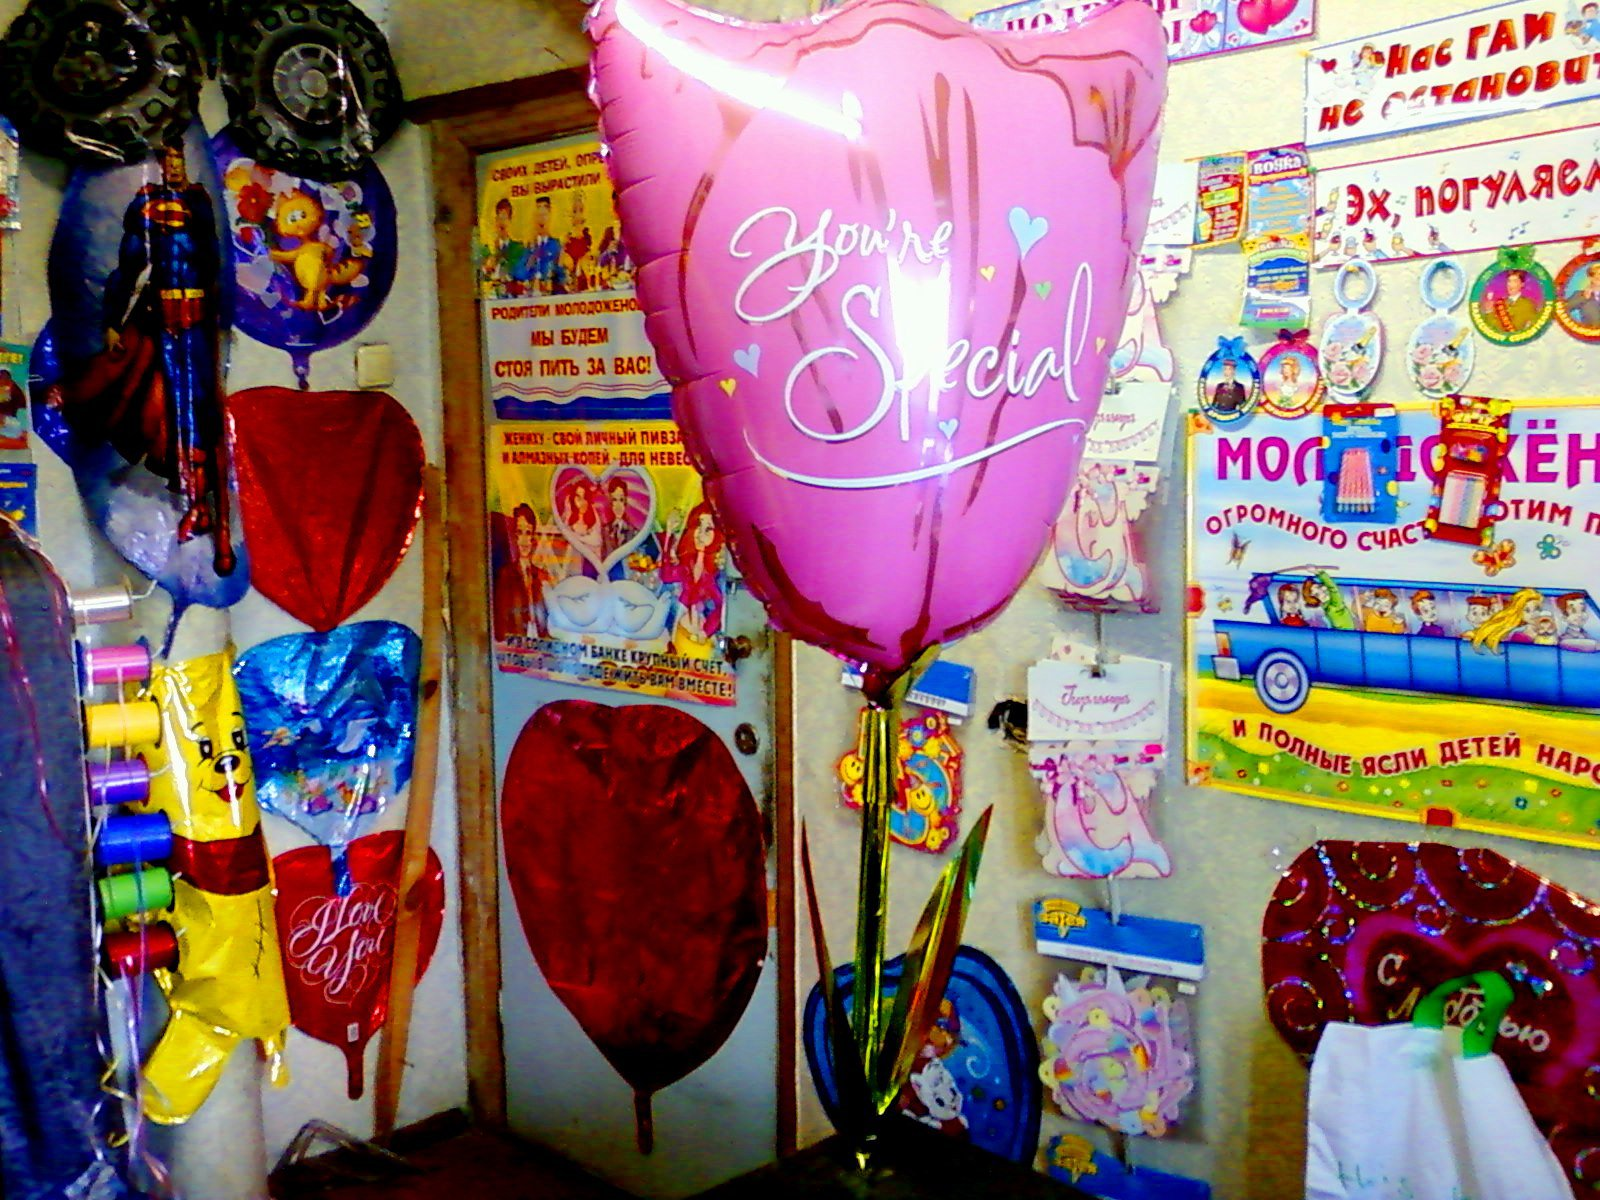 Ходячий шар Тюльпан - оригинальный подарок